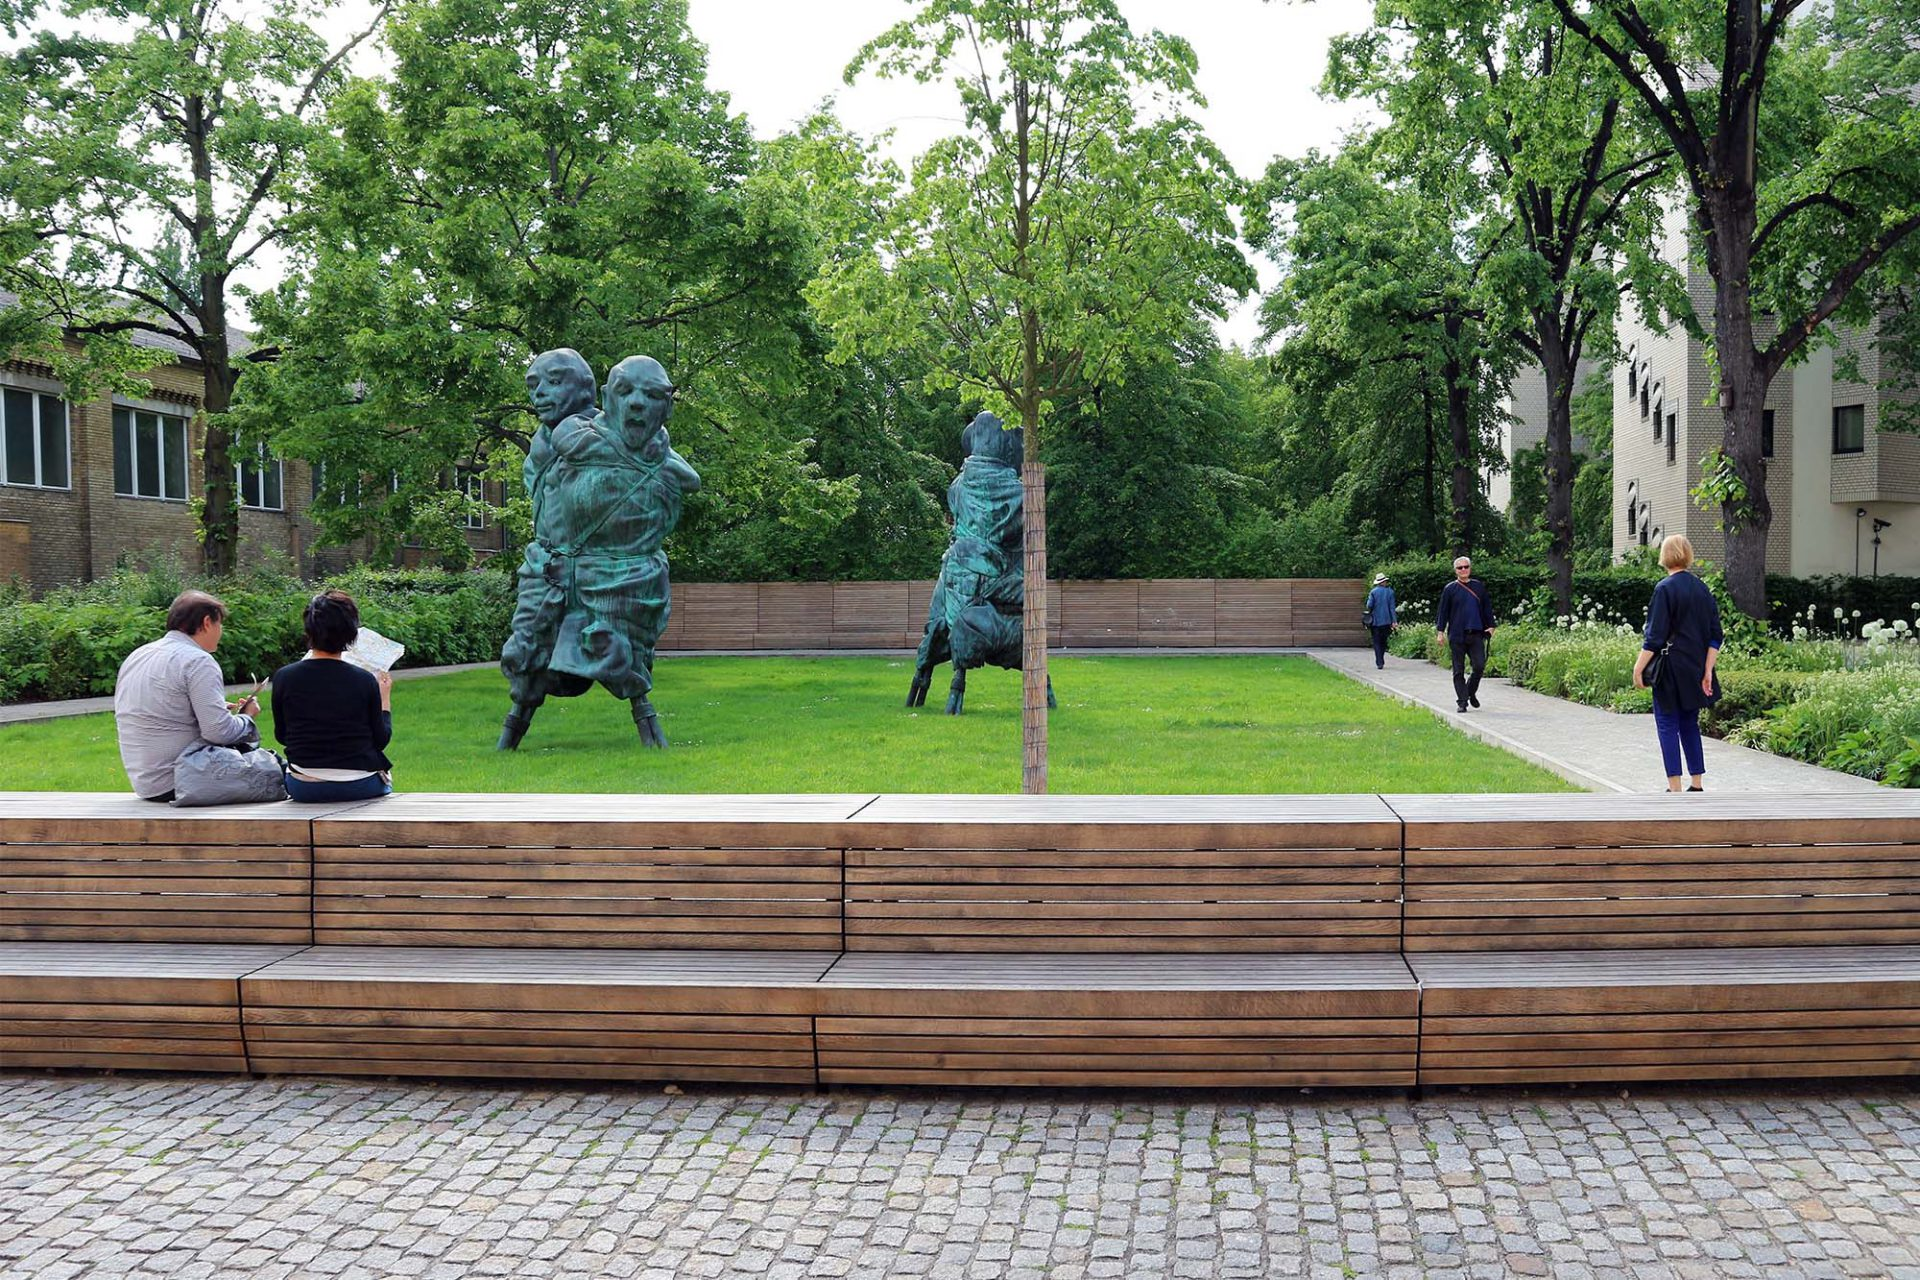 Idyllisch. Bröhan-Museum und Museum Berggruen umschließen einen famosen Skulpturengarten. Er wurde in Erinnerung an Berggruens Ehefrau